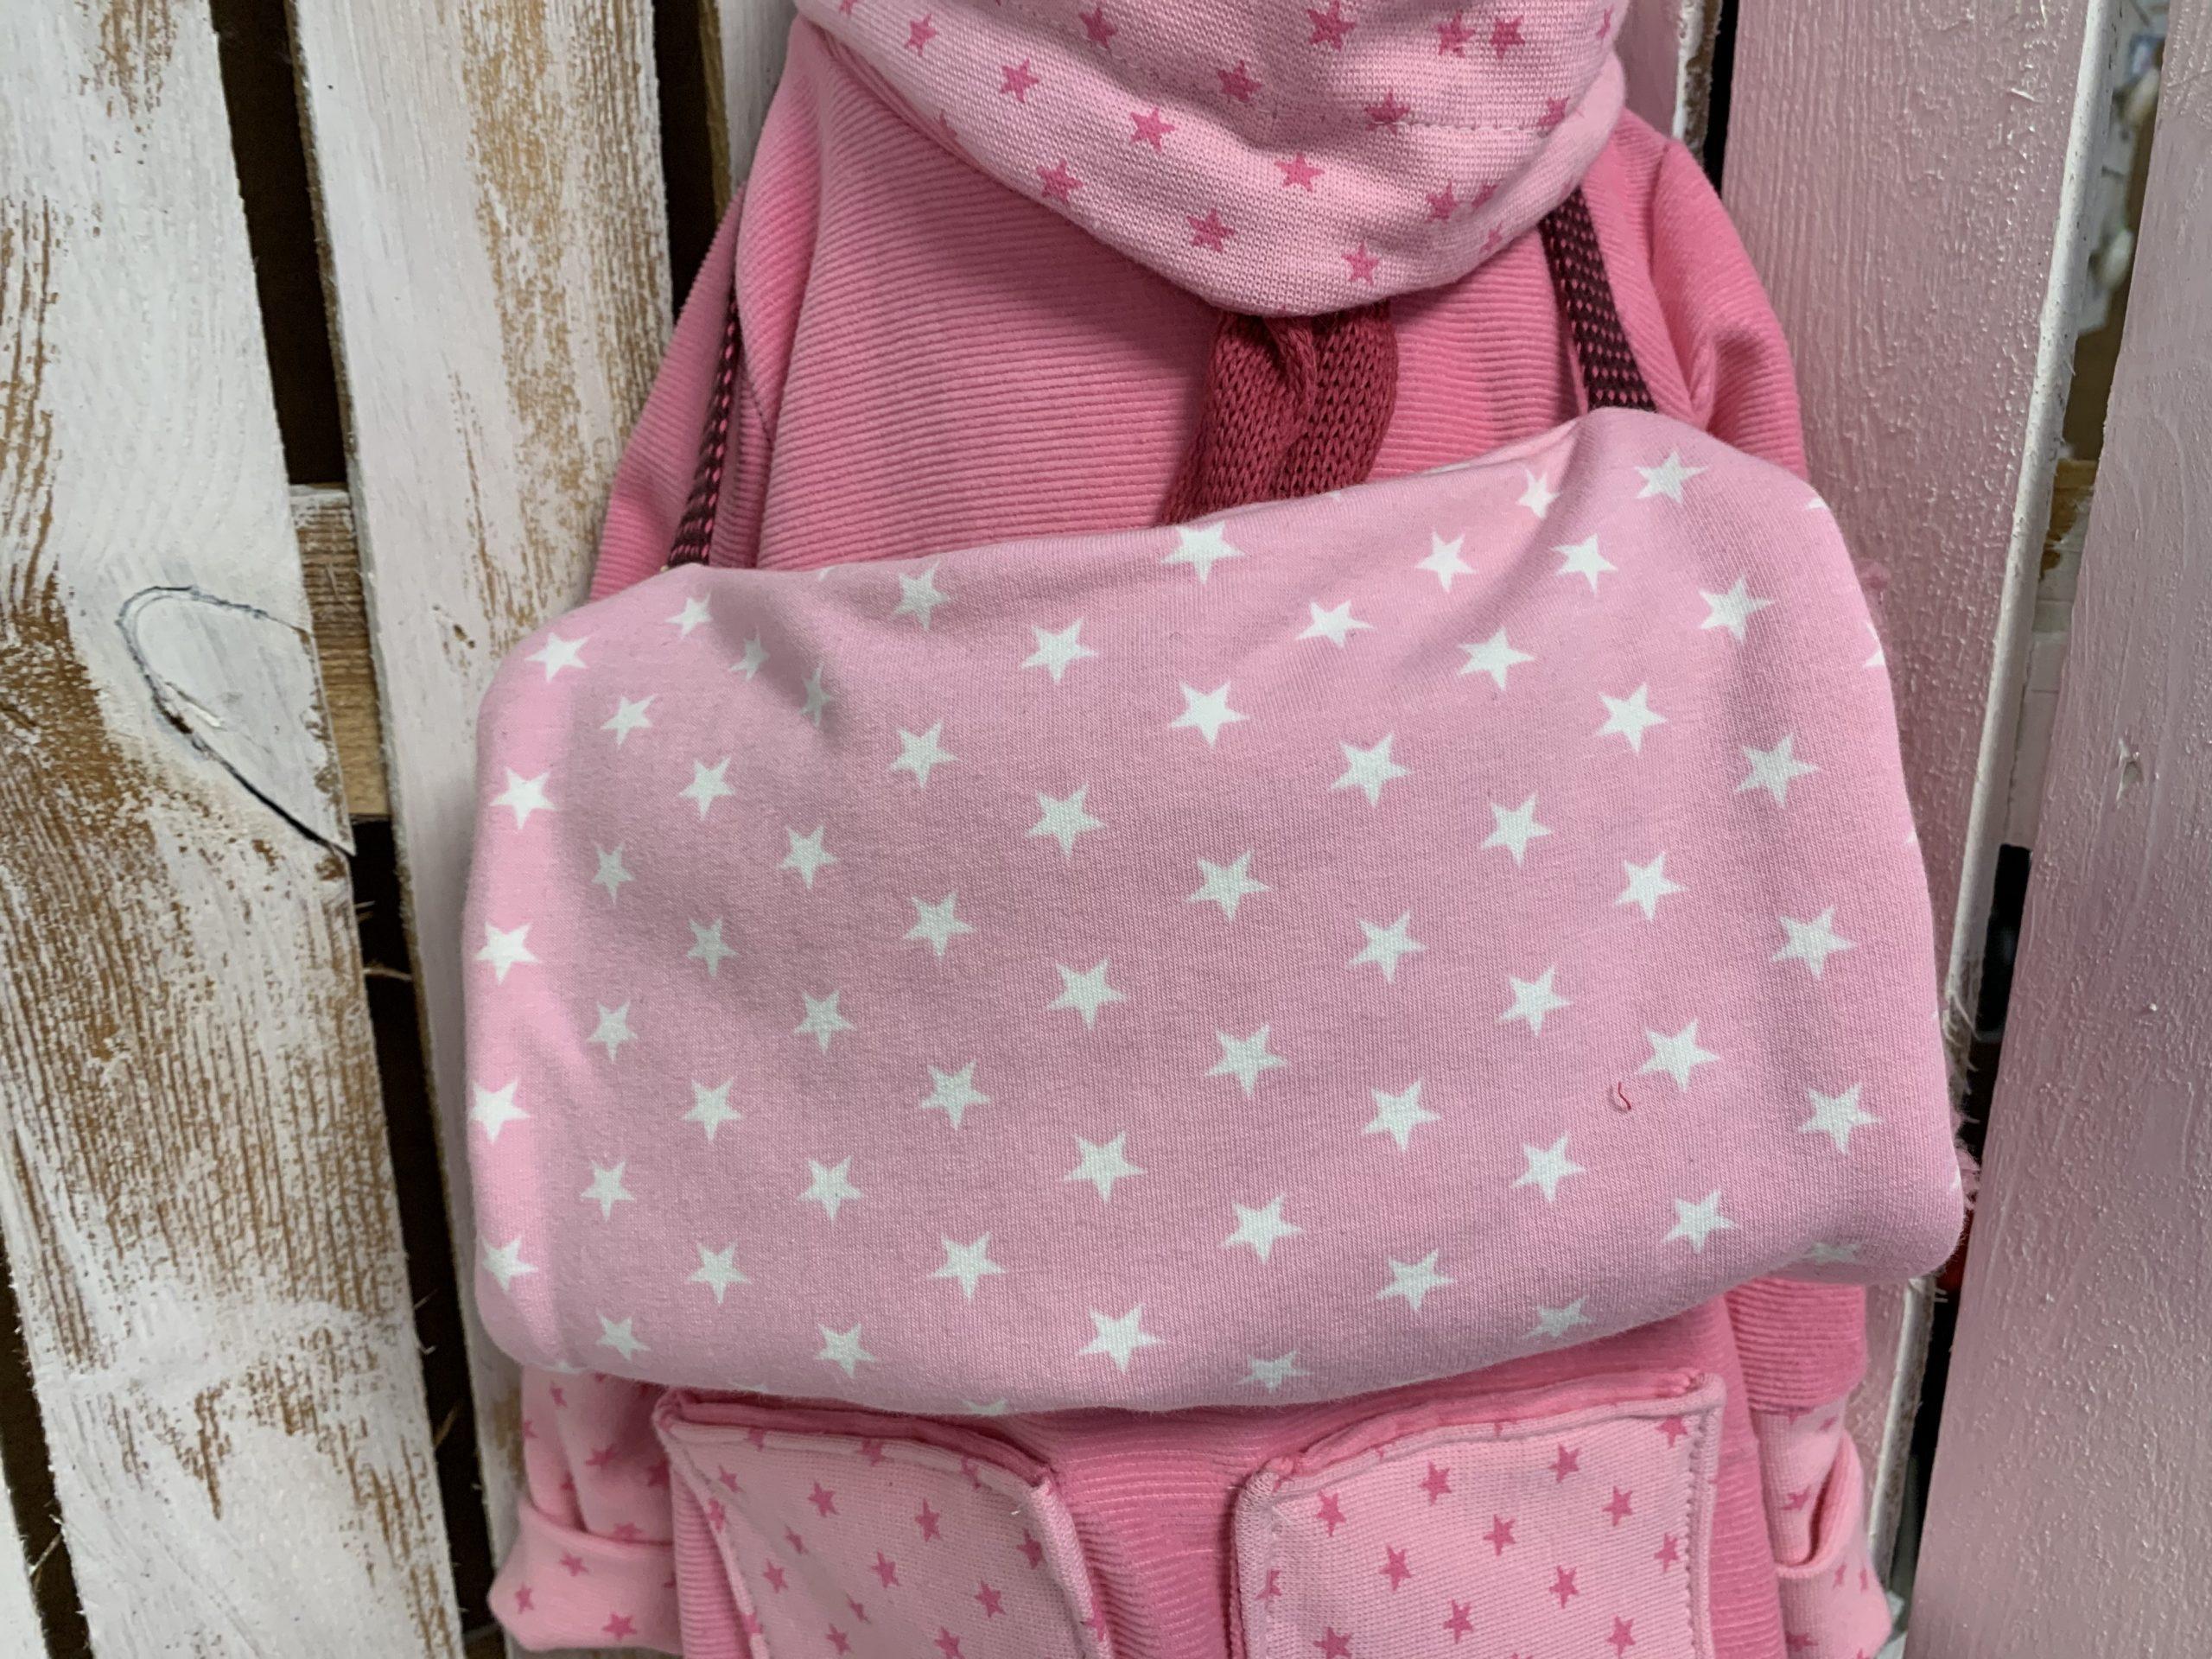 Kindermuff in rosa